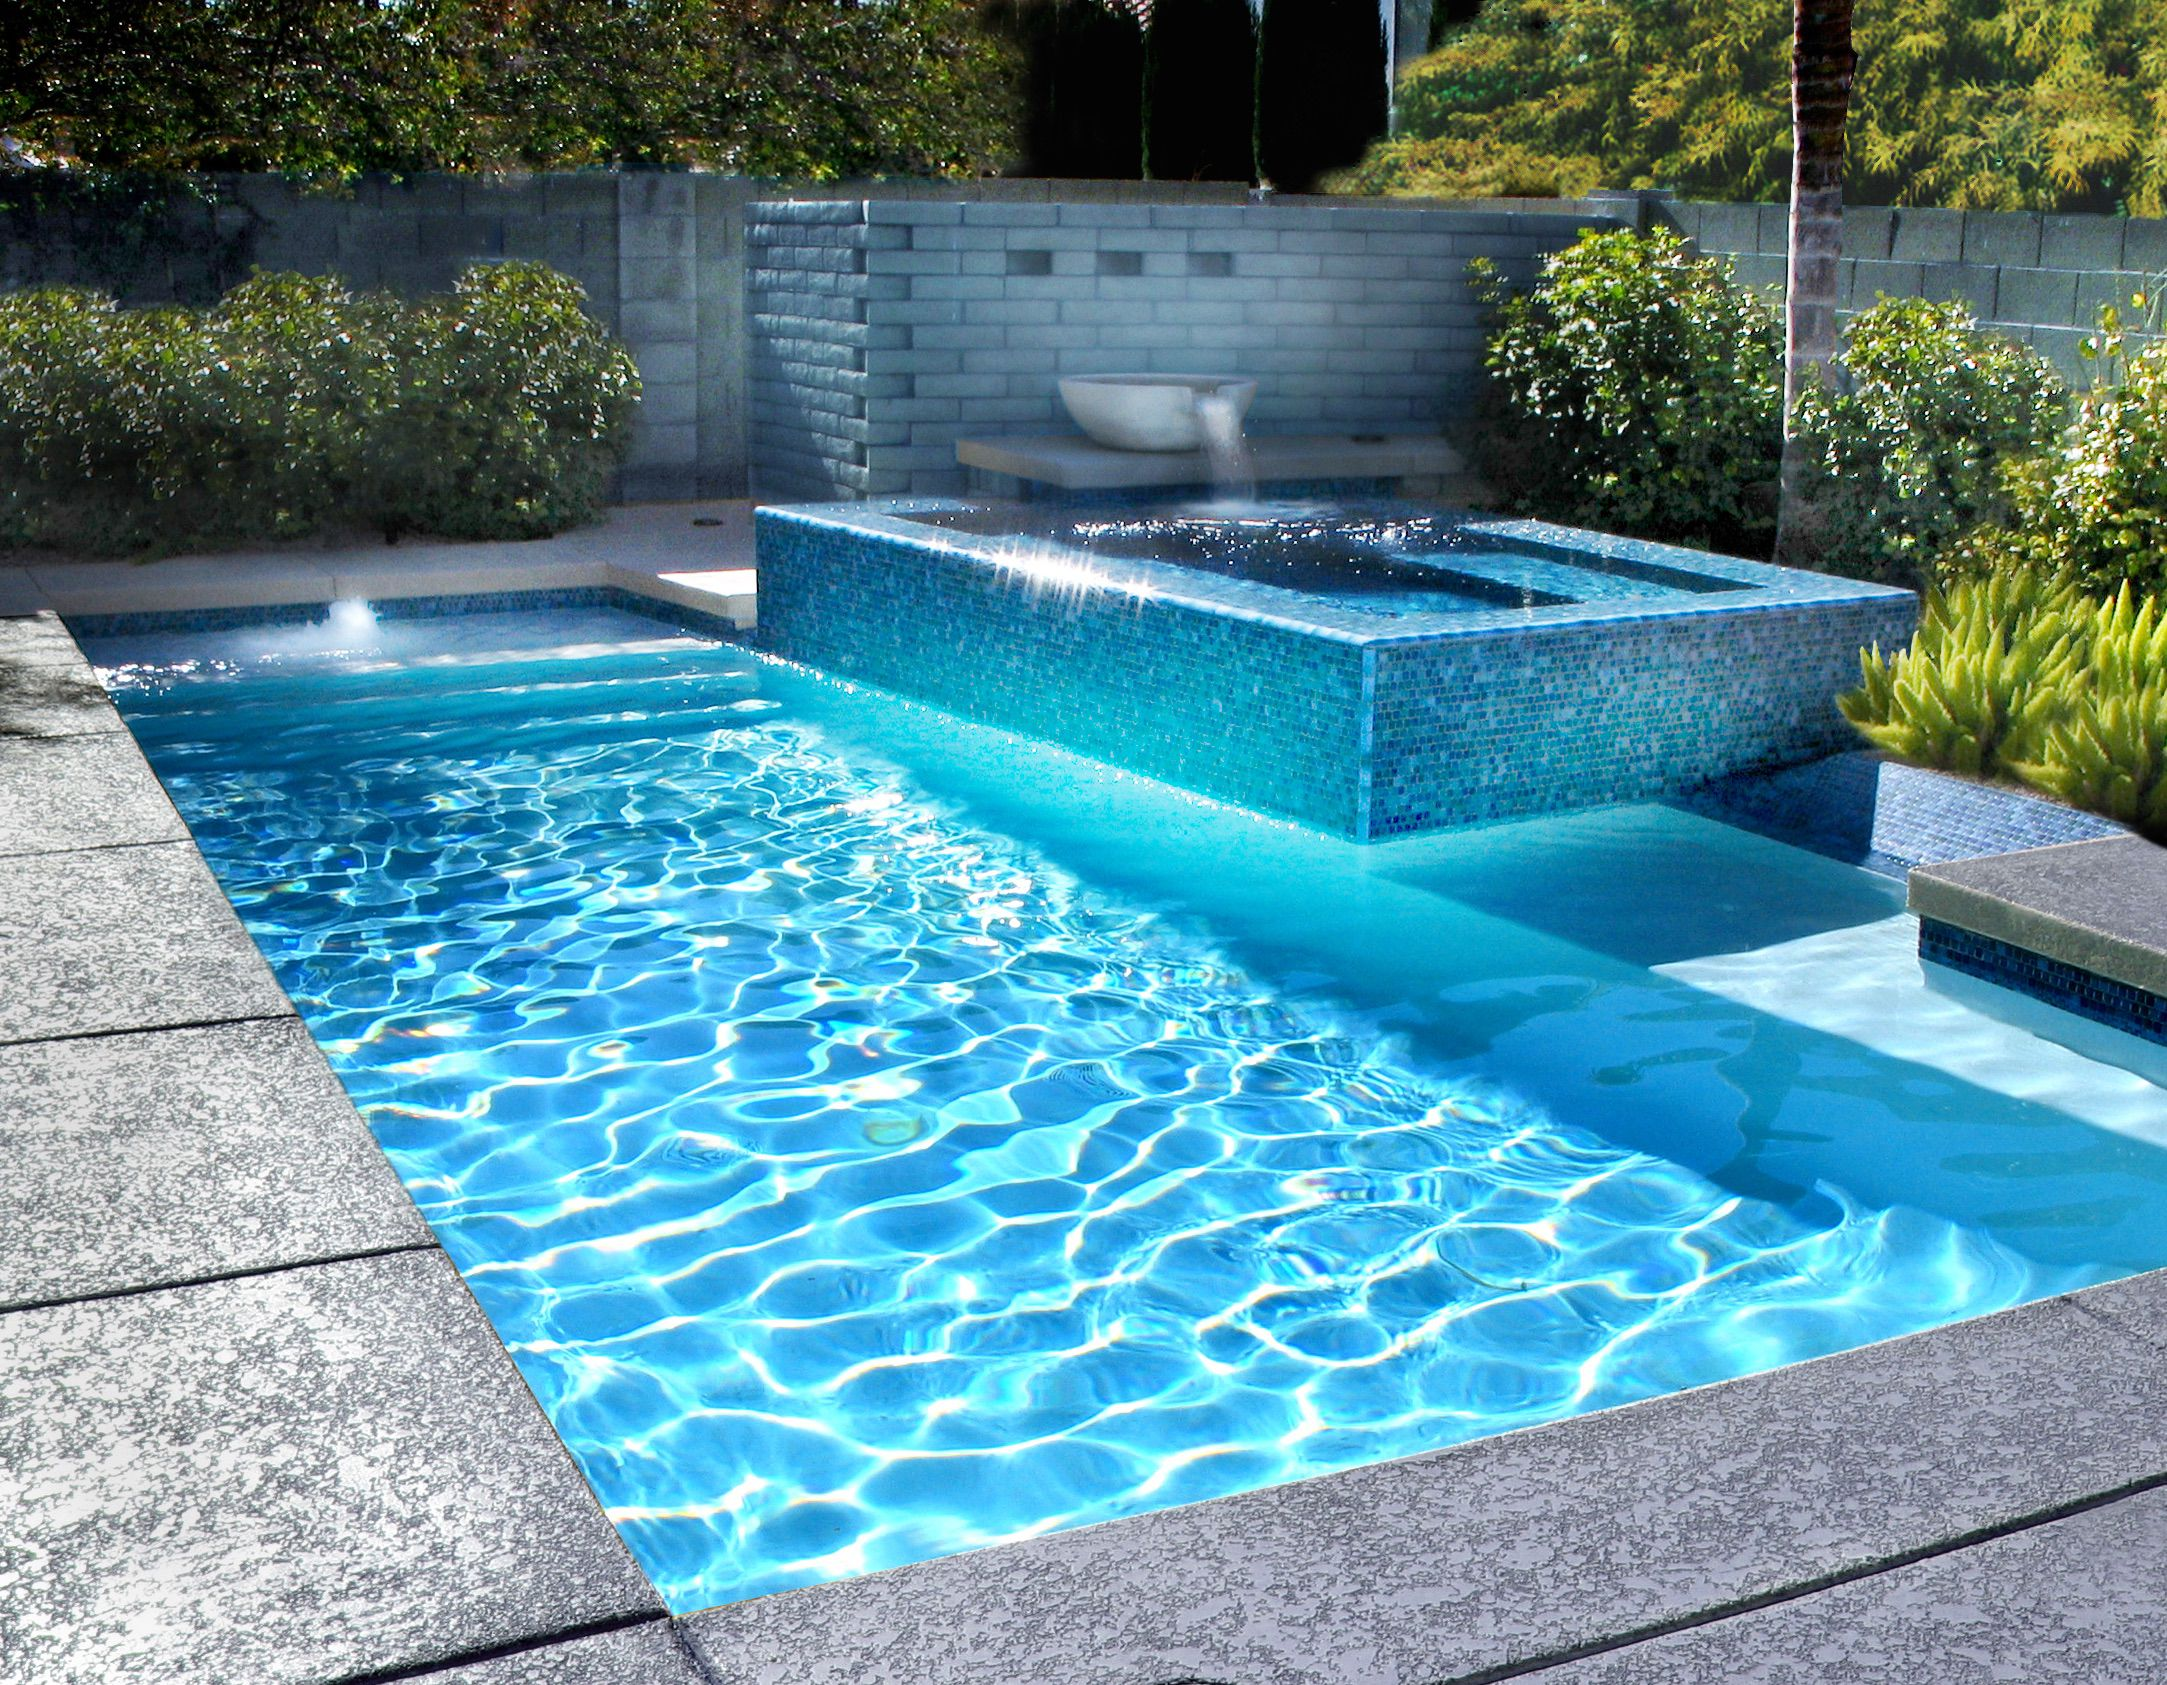 Brilliant blue pool